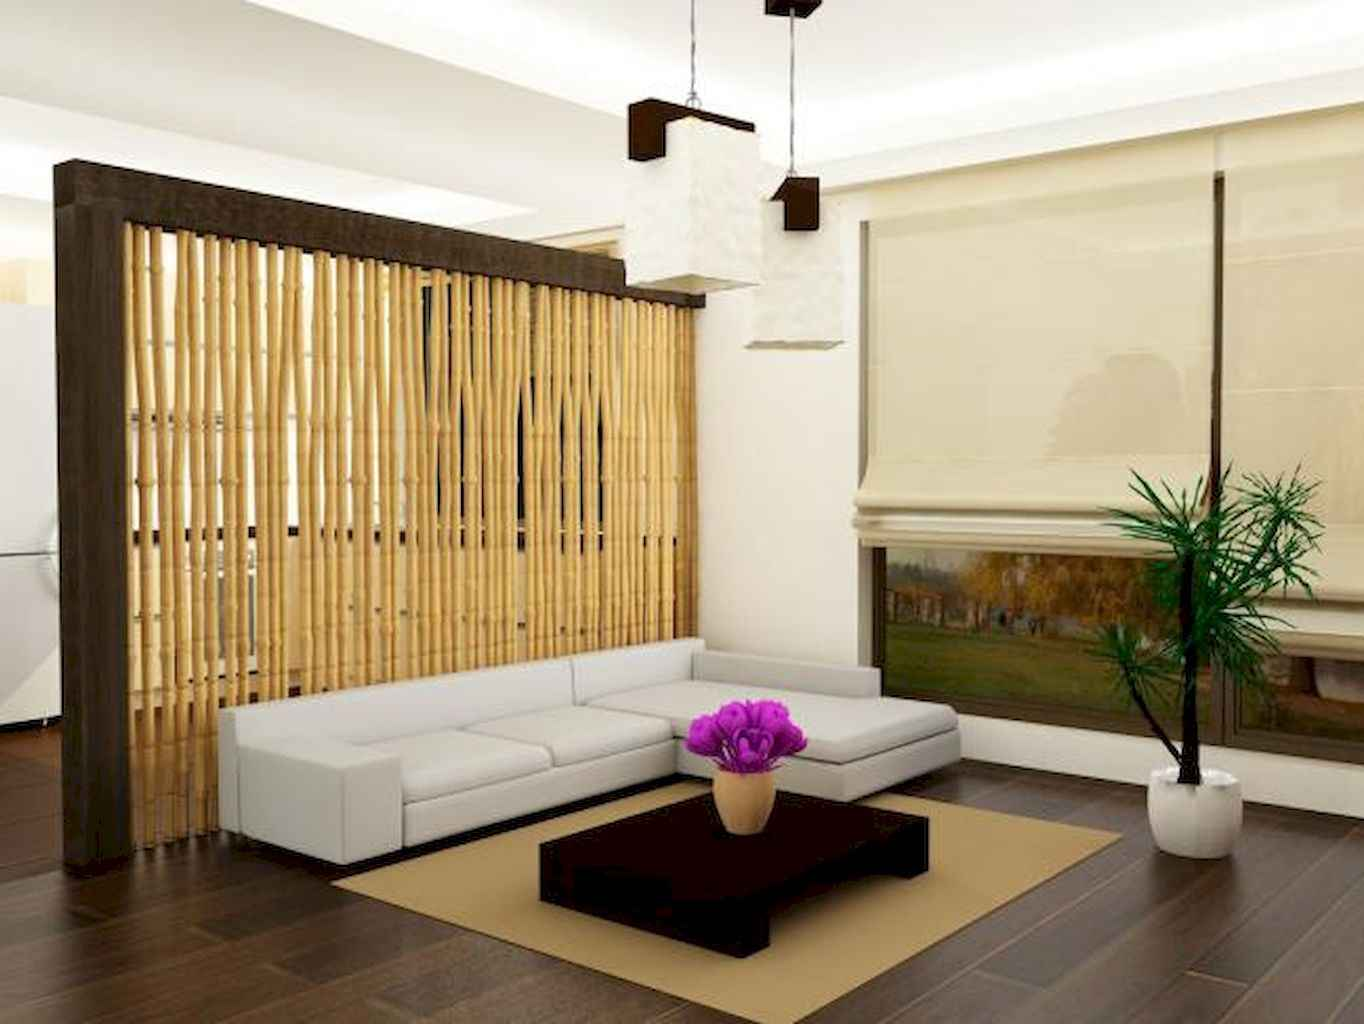 80 Elegant Harmony Interior Design Ideas For First Couple (41)